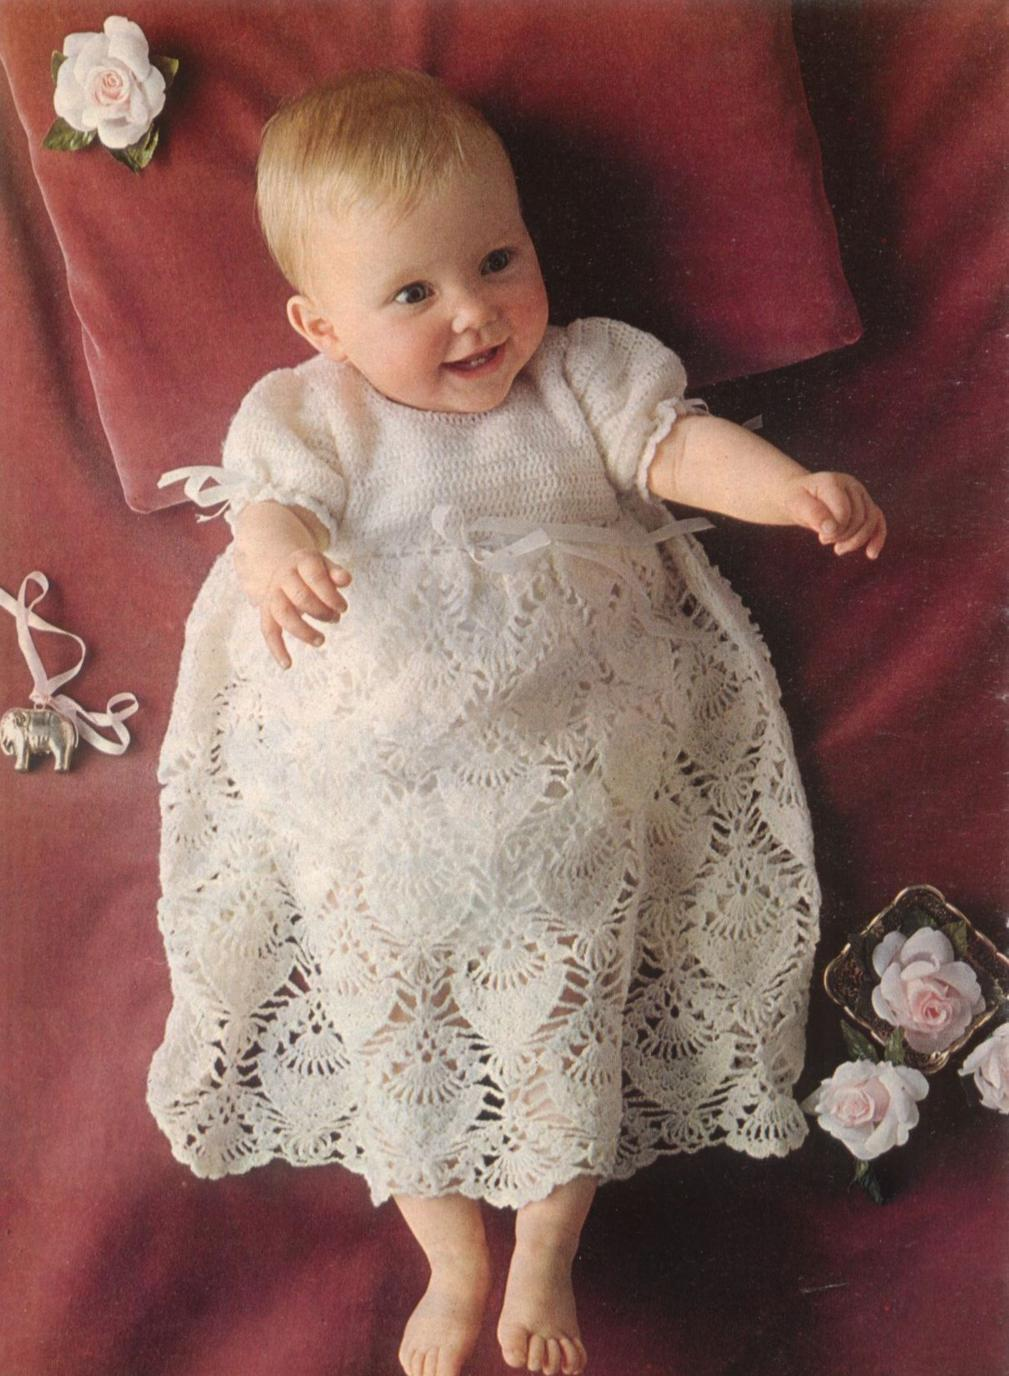 Pineapple Lace Crochet Christening Gown Pattern ⋆ Crochet